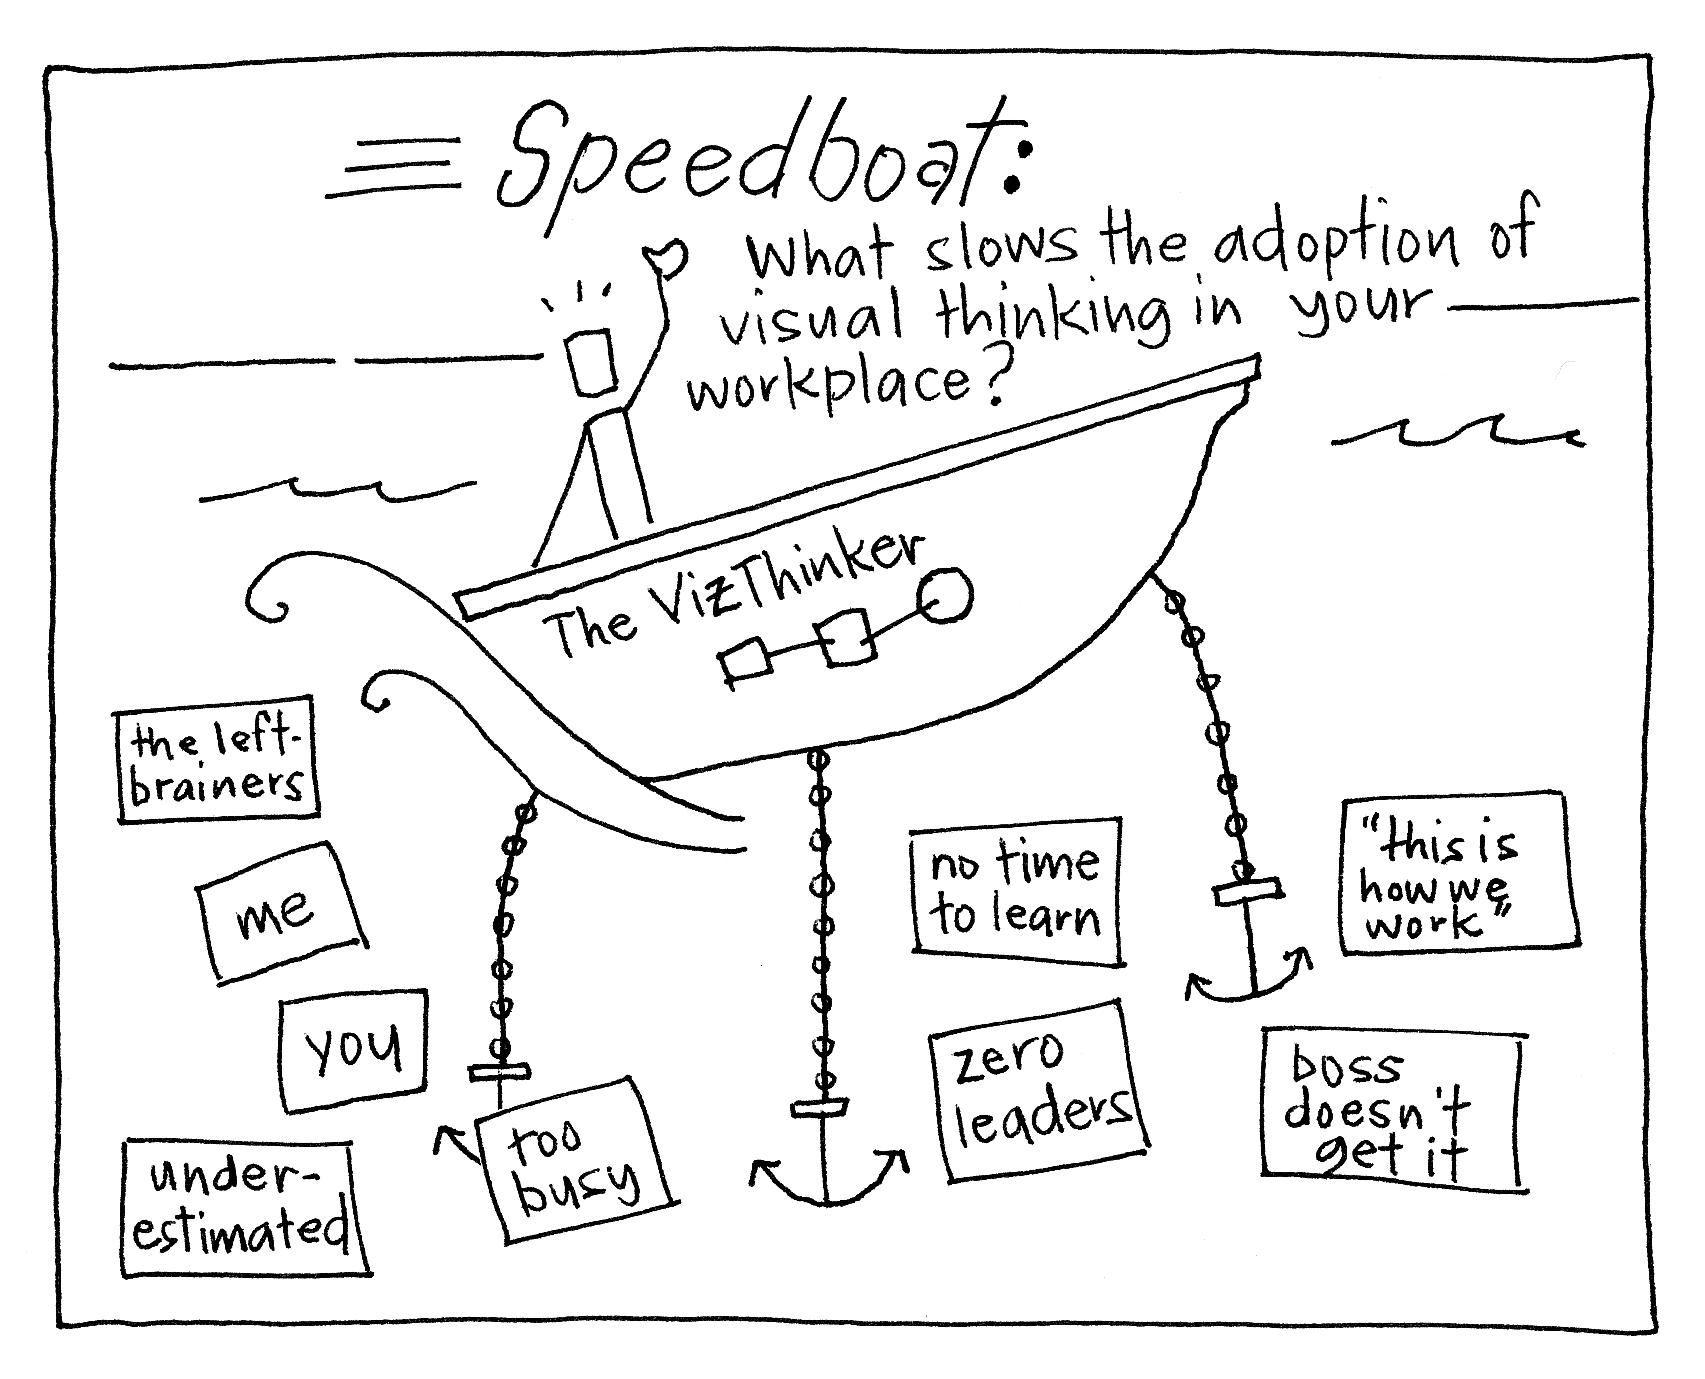 Gamestorming Blog Archive Speed Boat